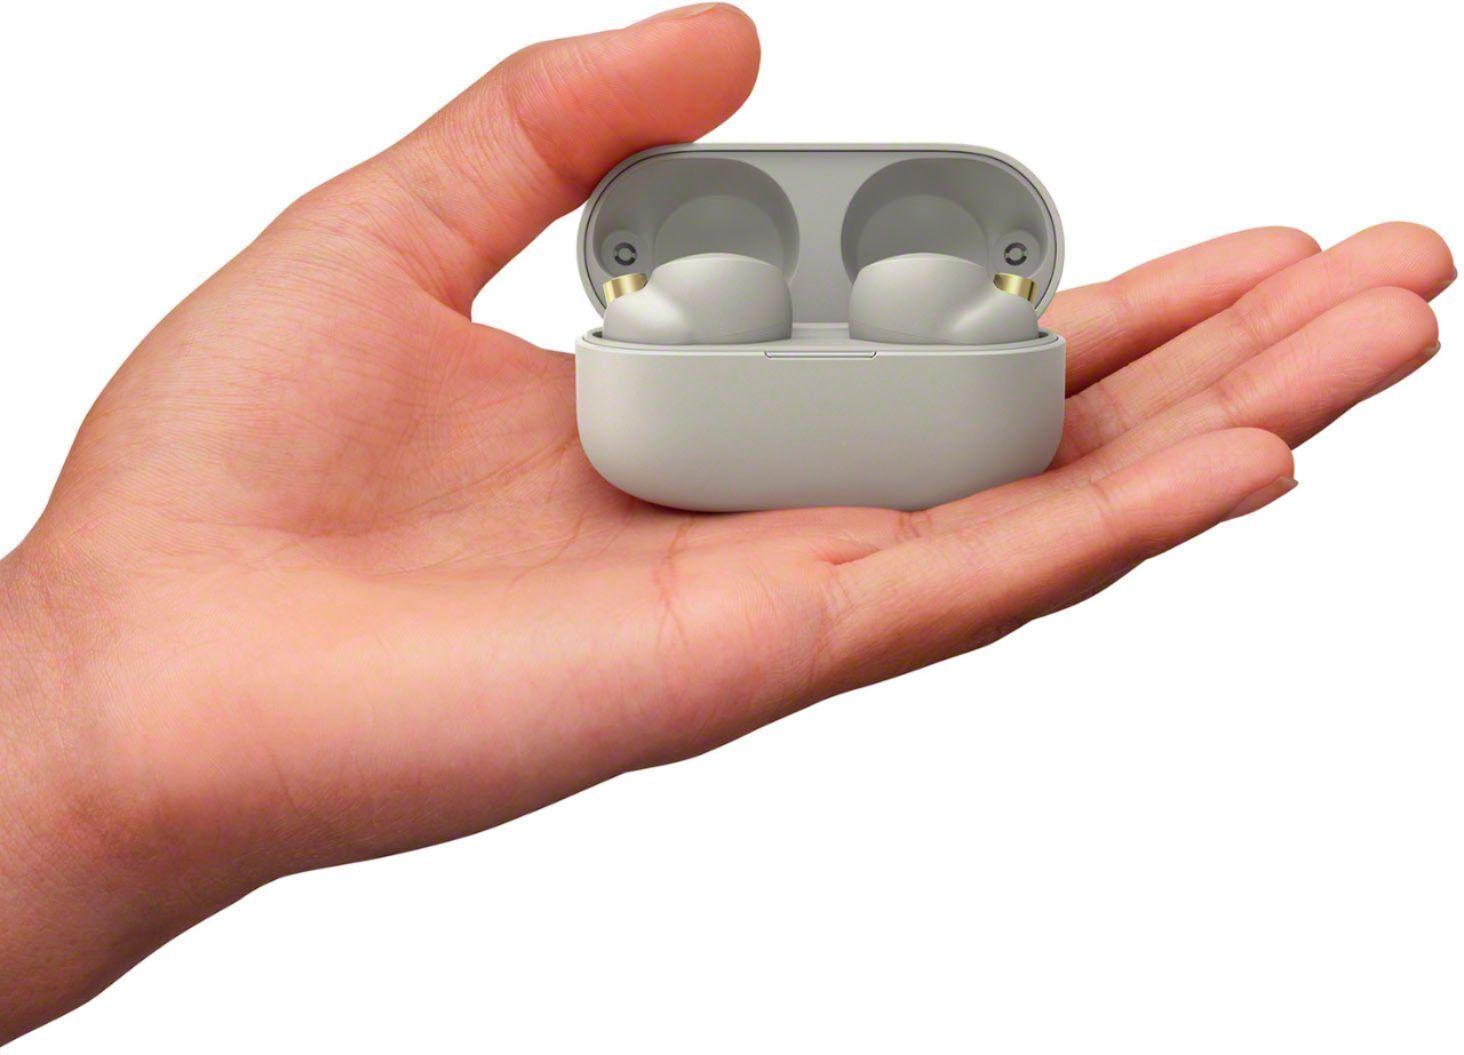 True Wireless наушники WF-1000XM4S серебристые в чехле